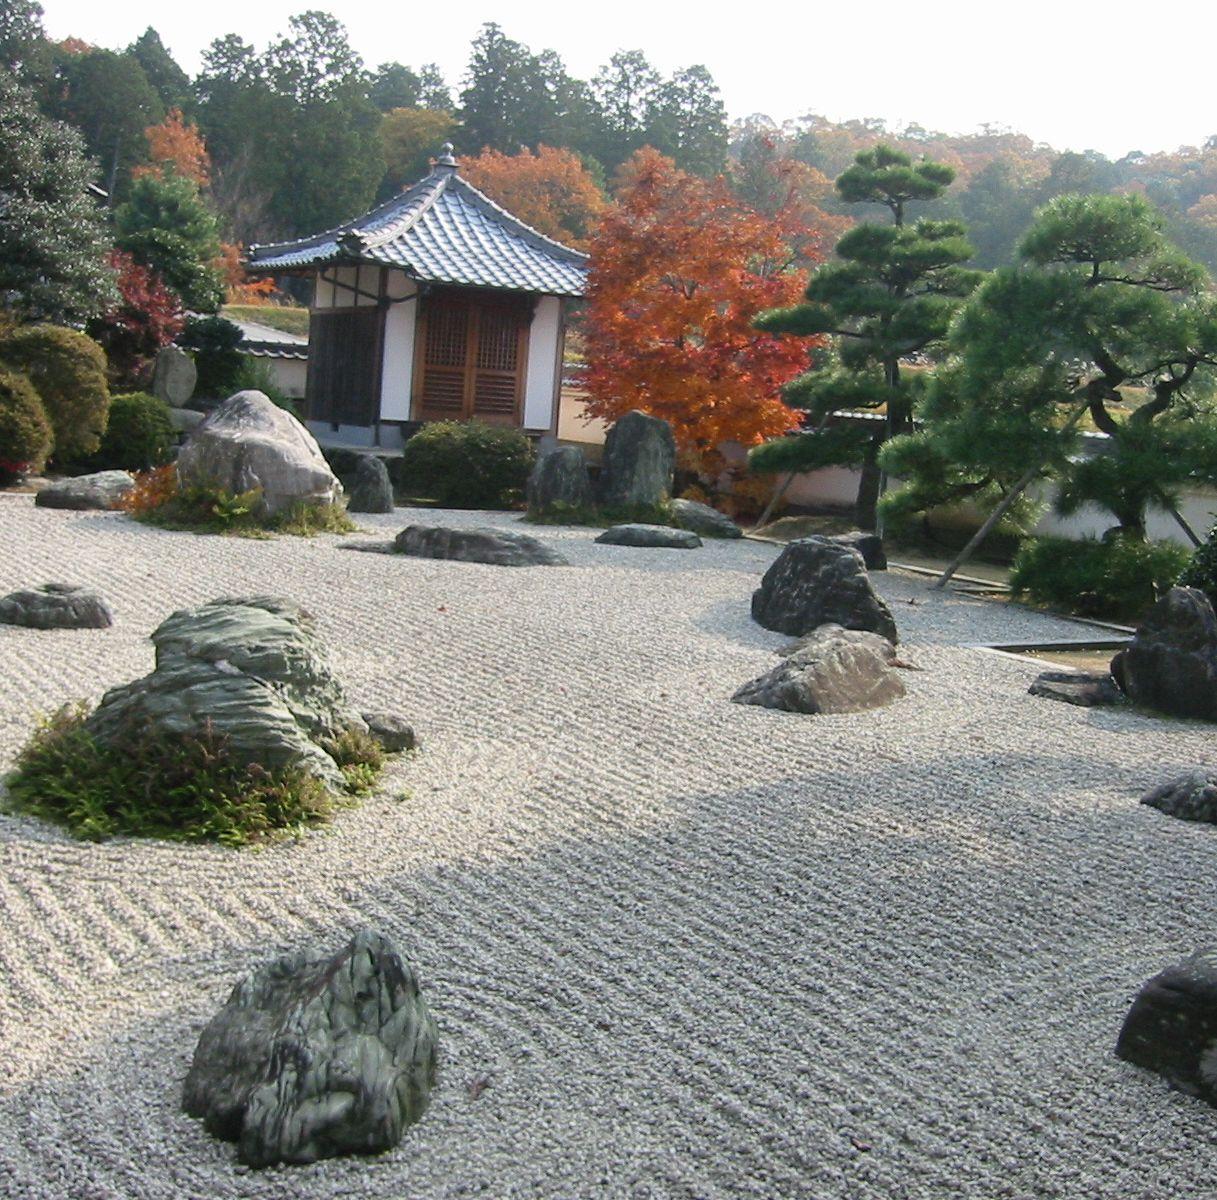 Giardino Zen In Italia : Cool giardino zen with giardini in italia